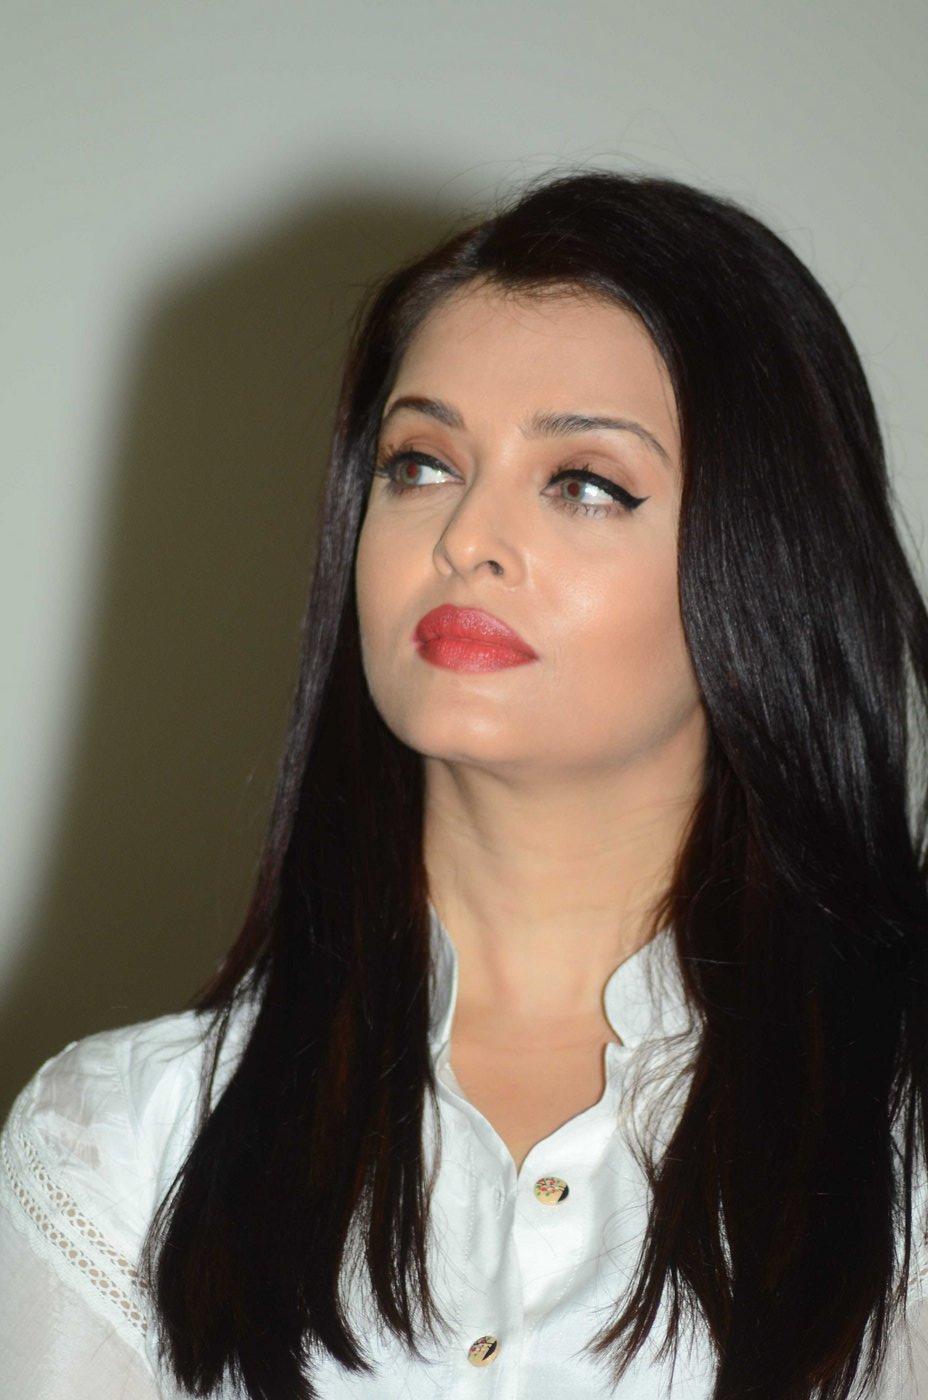 Aishwarya Rai strikes a 'bookish' pose - Emirates 24|7